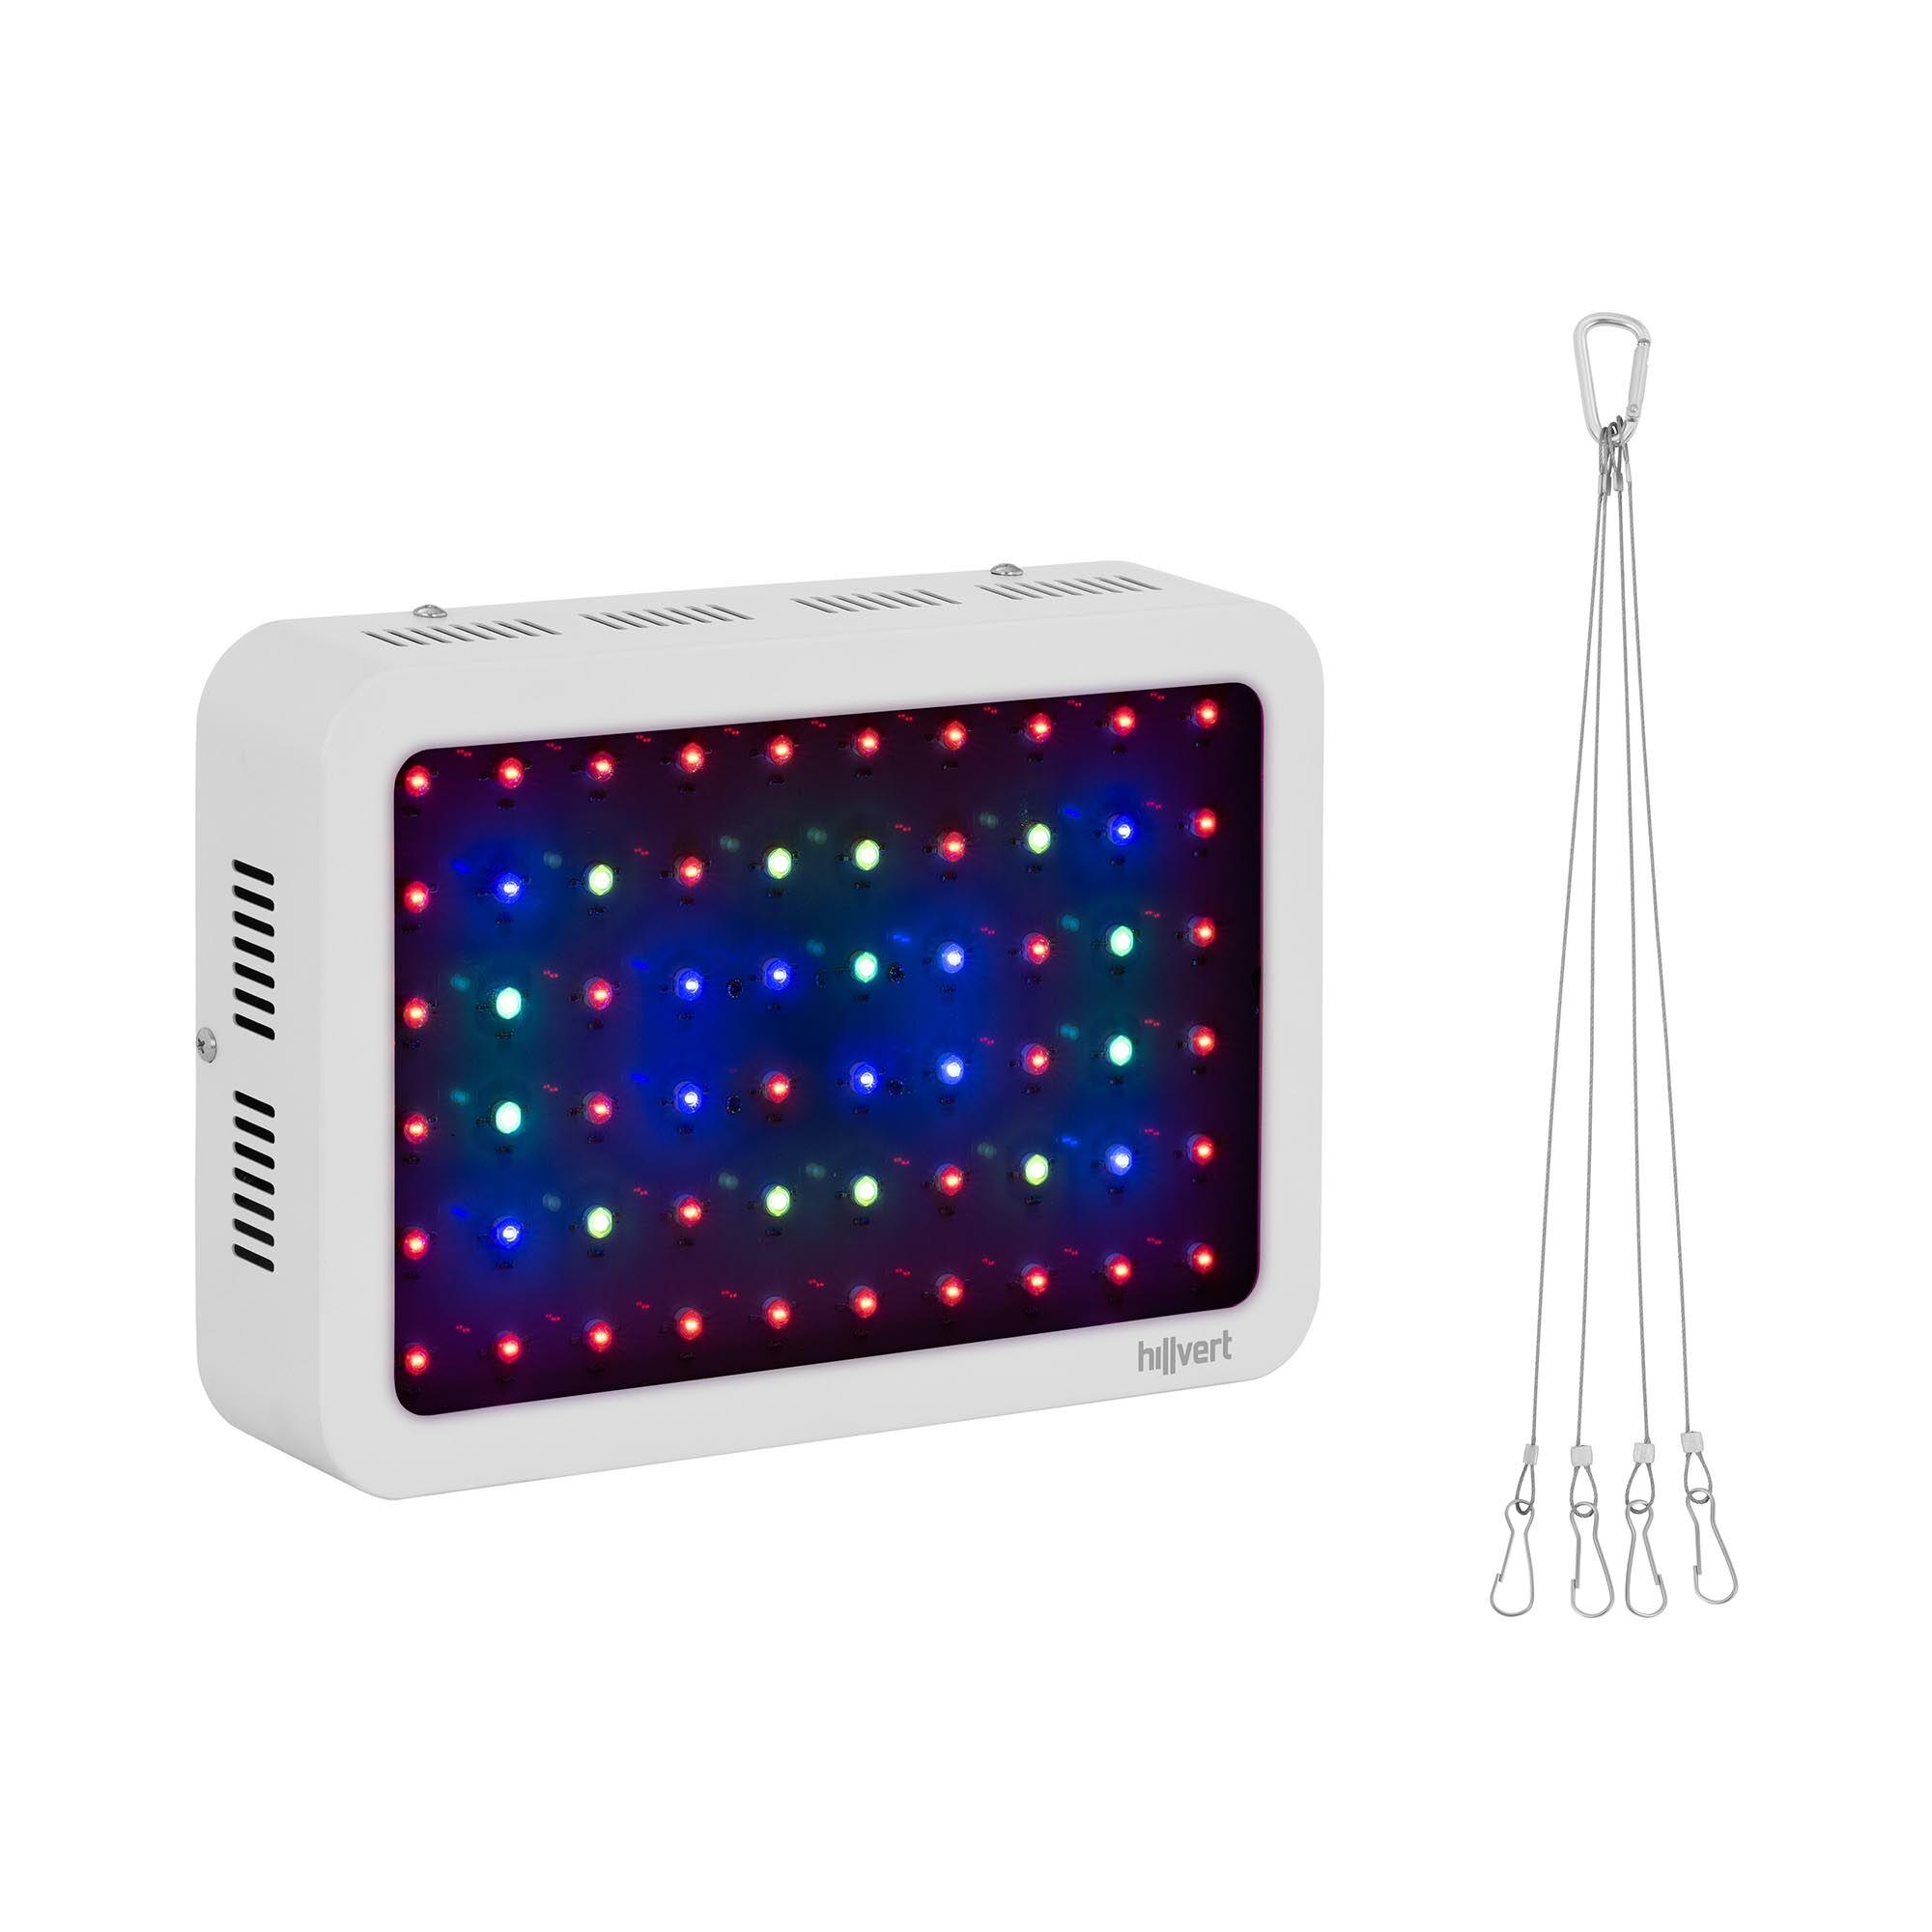 hillvert lampada per piante led - 600 w - 2.913 lumen ht-wedge-600